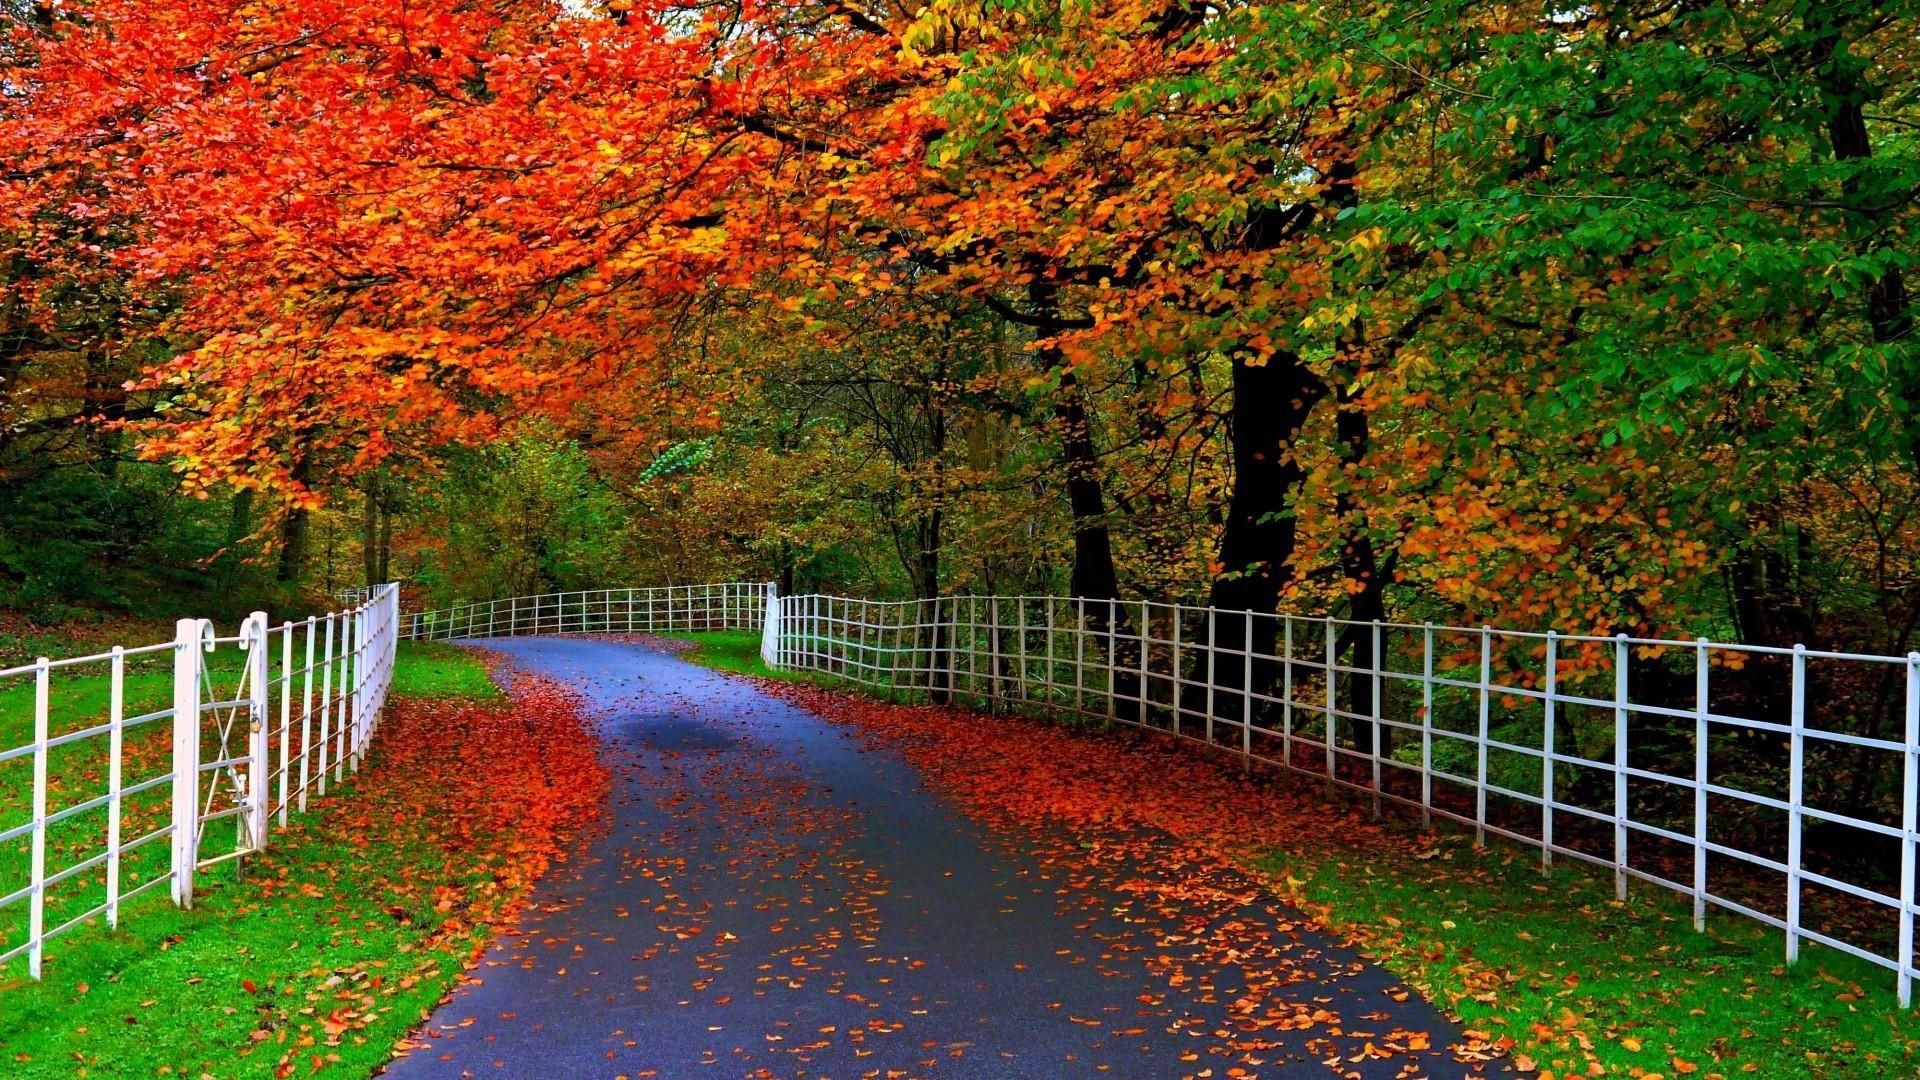 Beautiful Nature Wallpaper 1 Download Free Full HD Wallpapers For